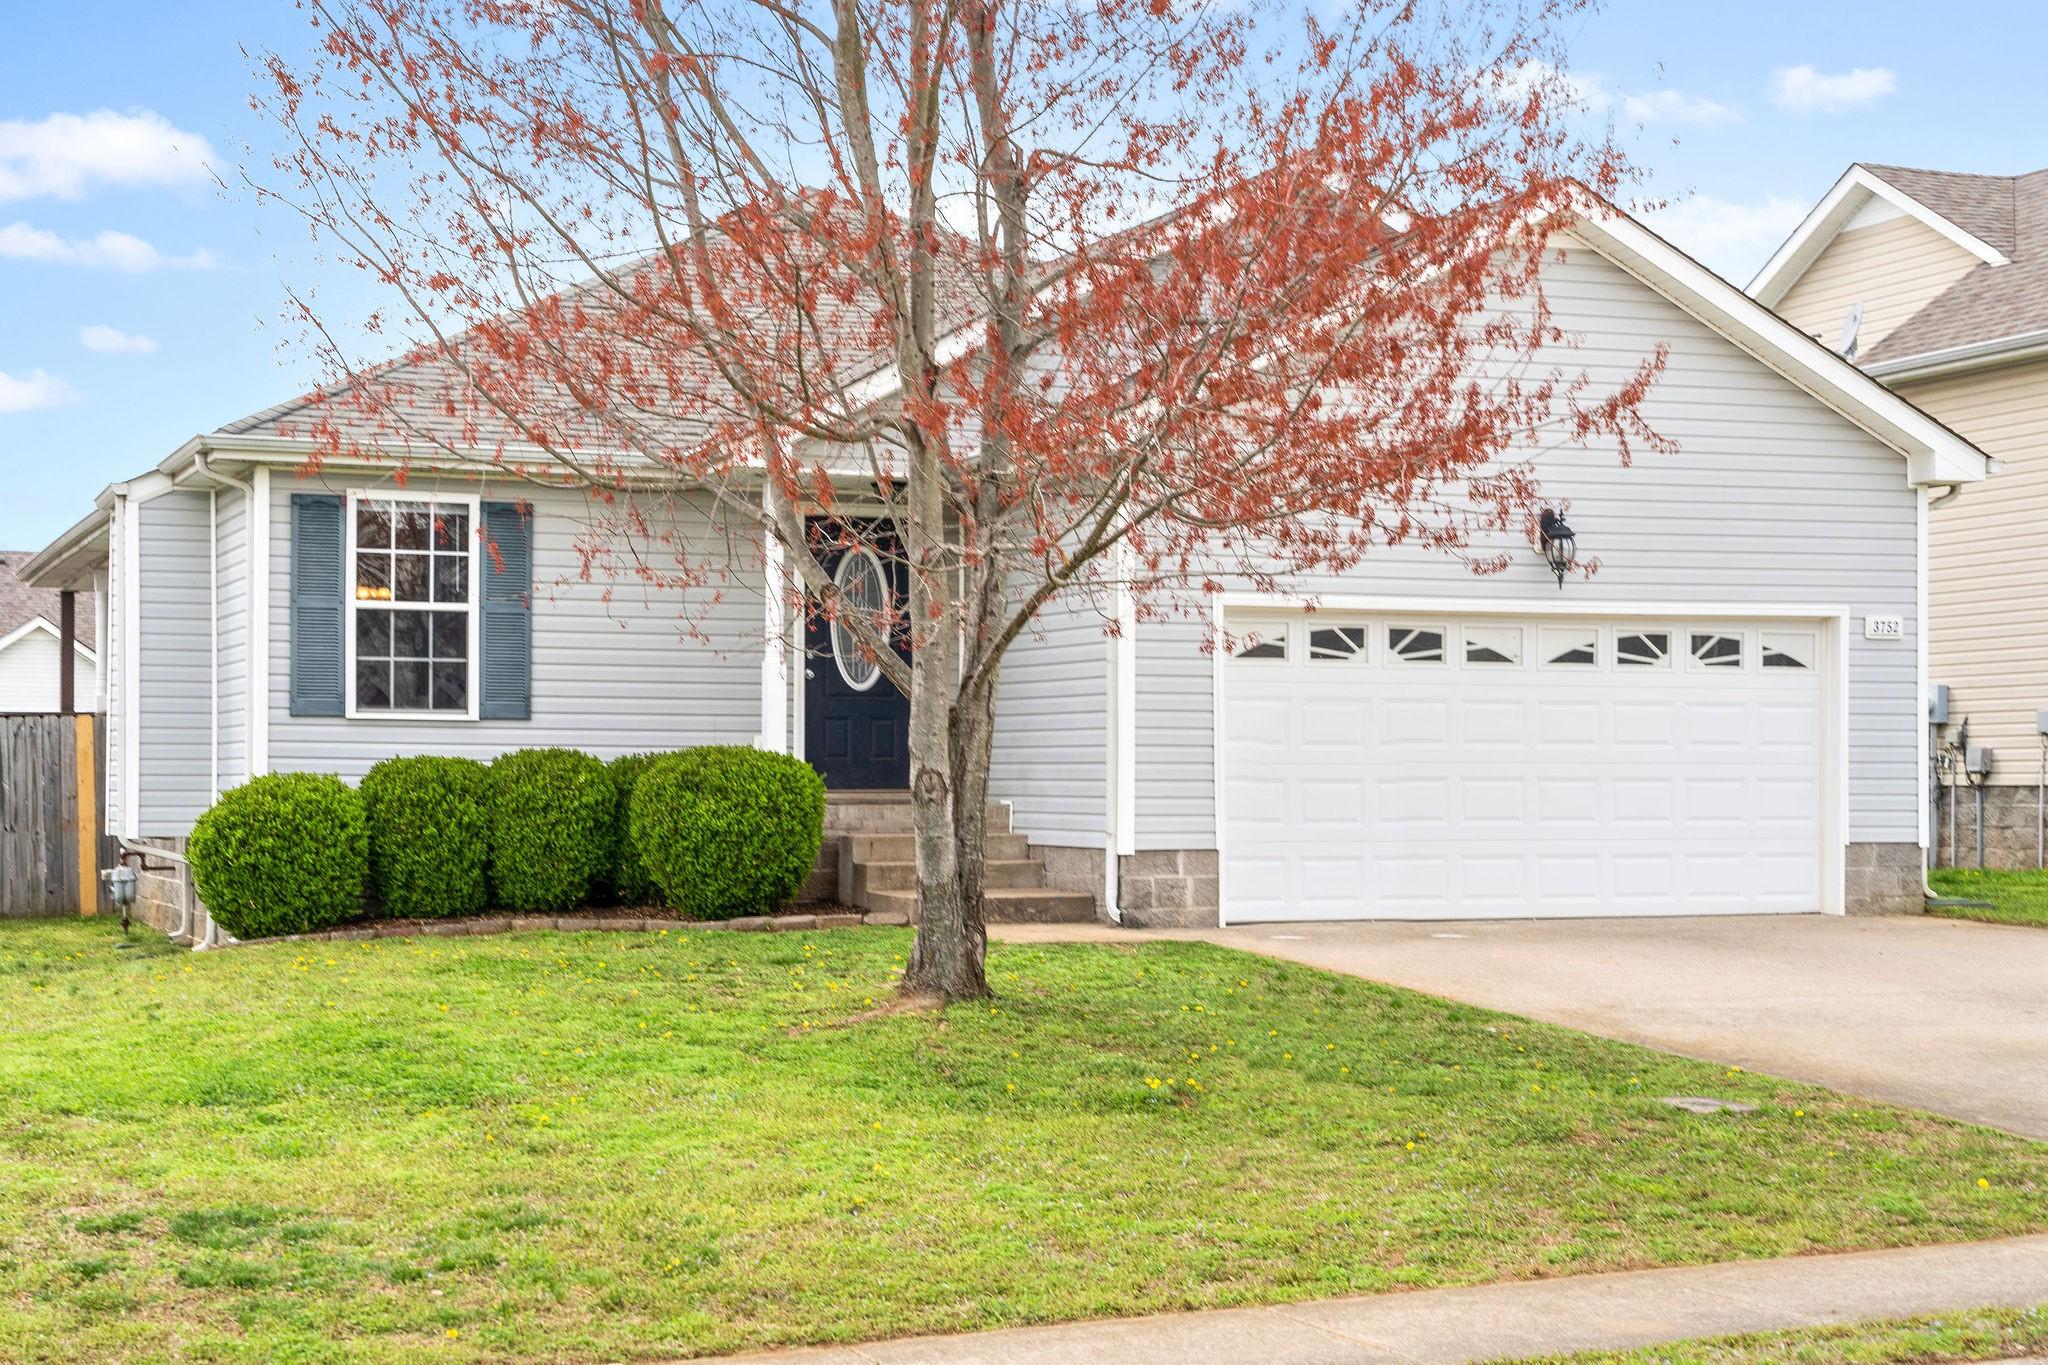 3752 N Jot Dr Property Photo - Clarksville, TN real estate listing